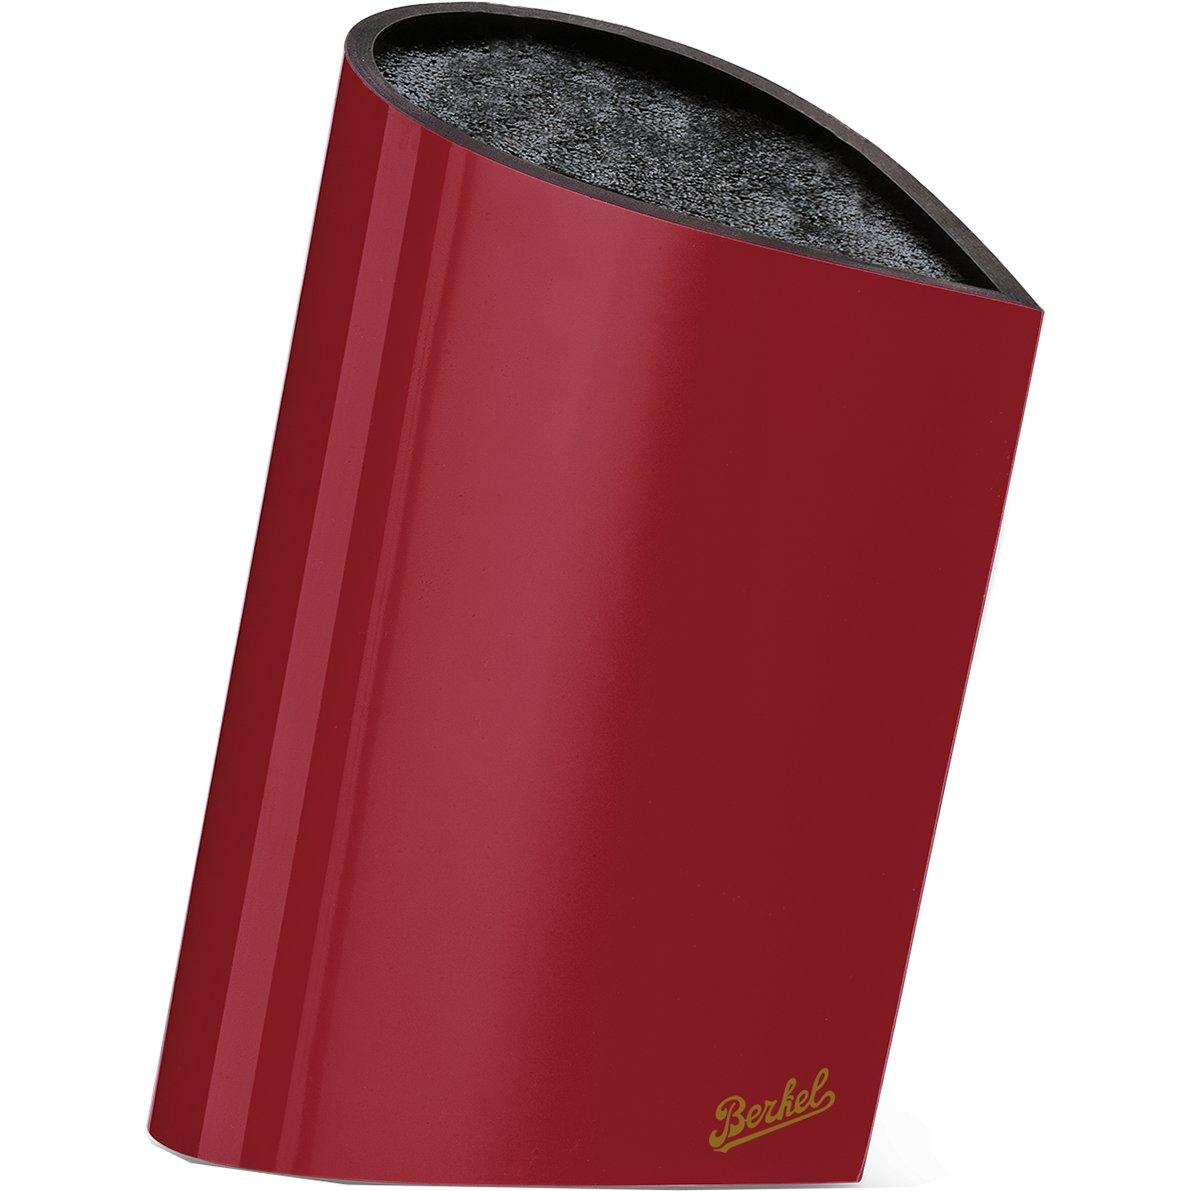 Berkel Messerblock Bag Rot ohne Messern